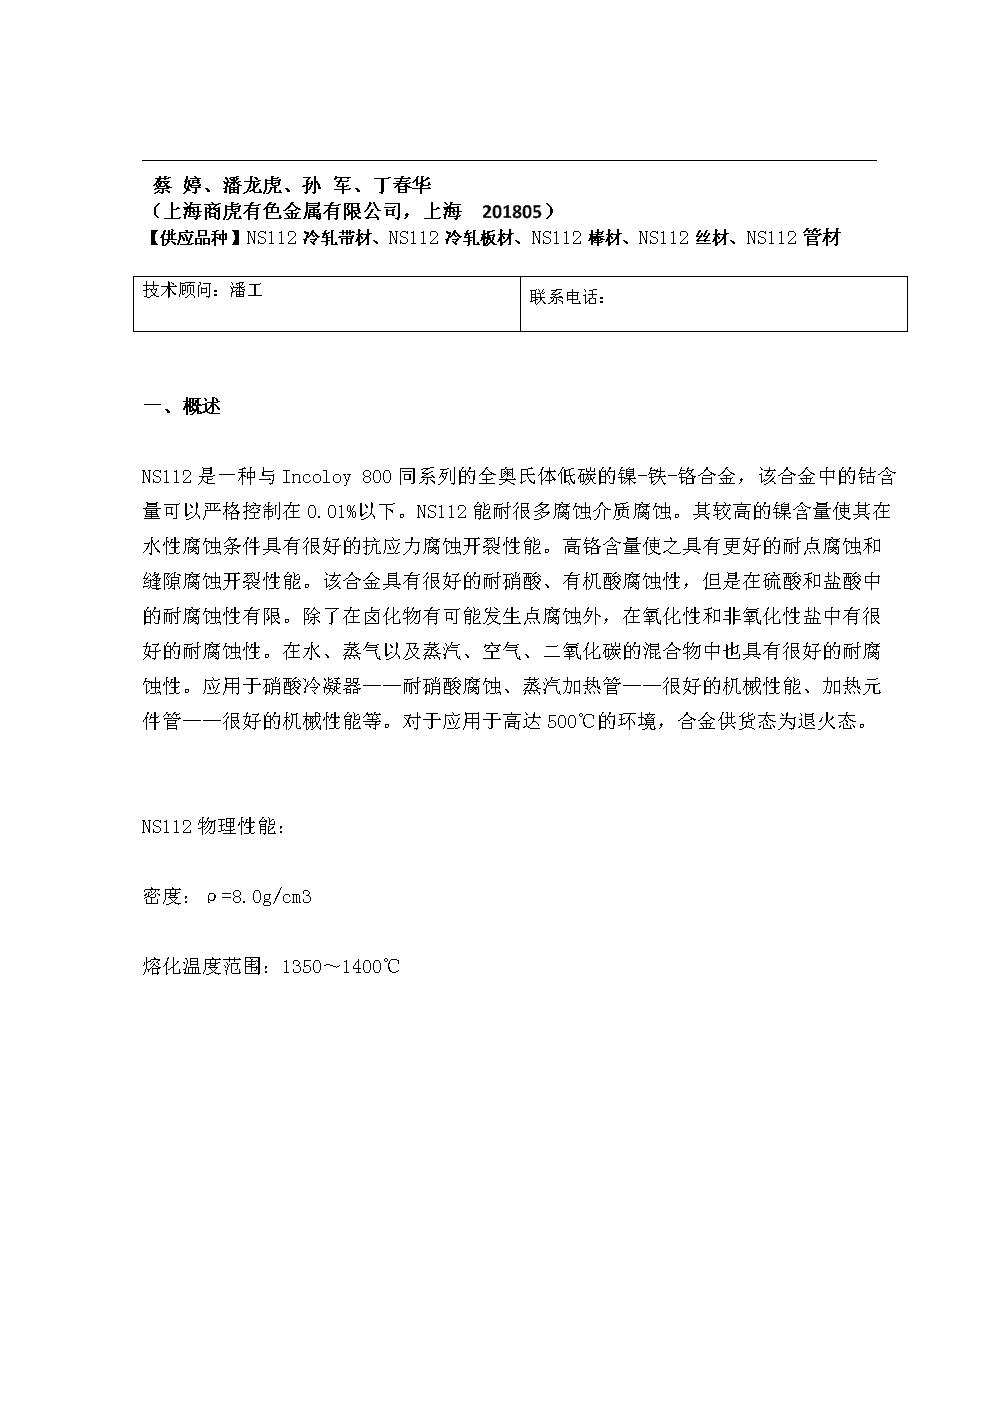 NS112-上海商虎合金技术.doc